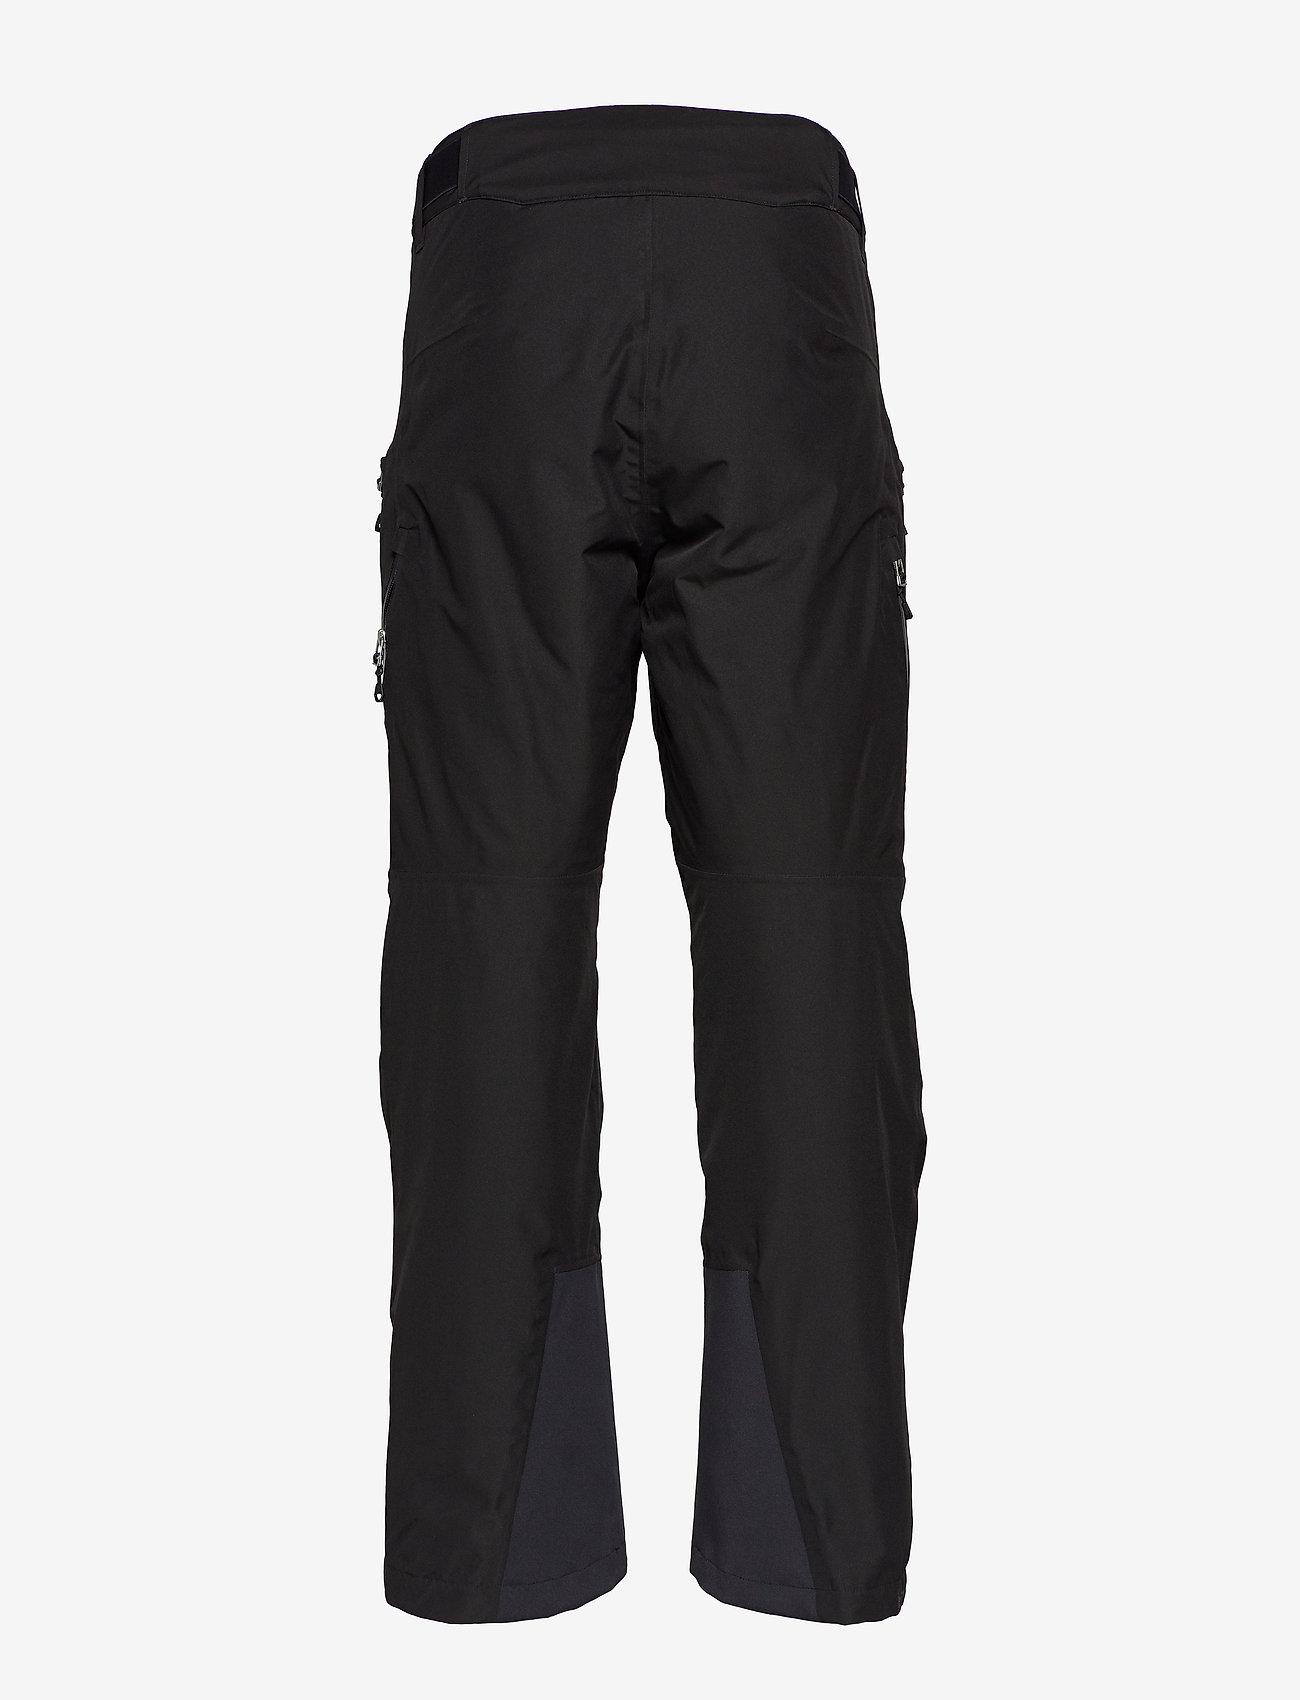 Bergans - Stranda Ins Pnt - insulated pantsinsulated pants - black/solidcharcoal - 1